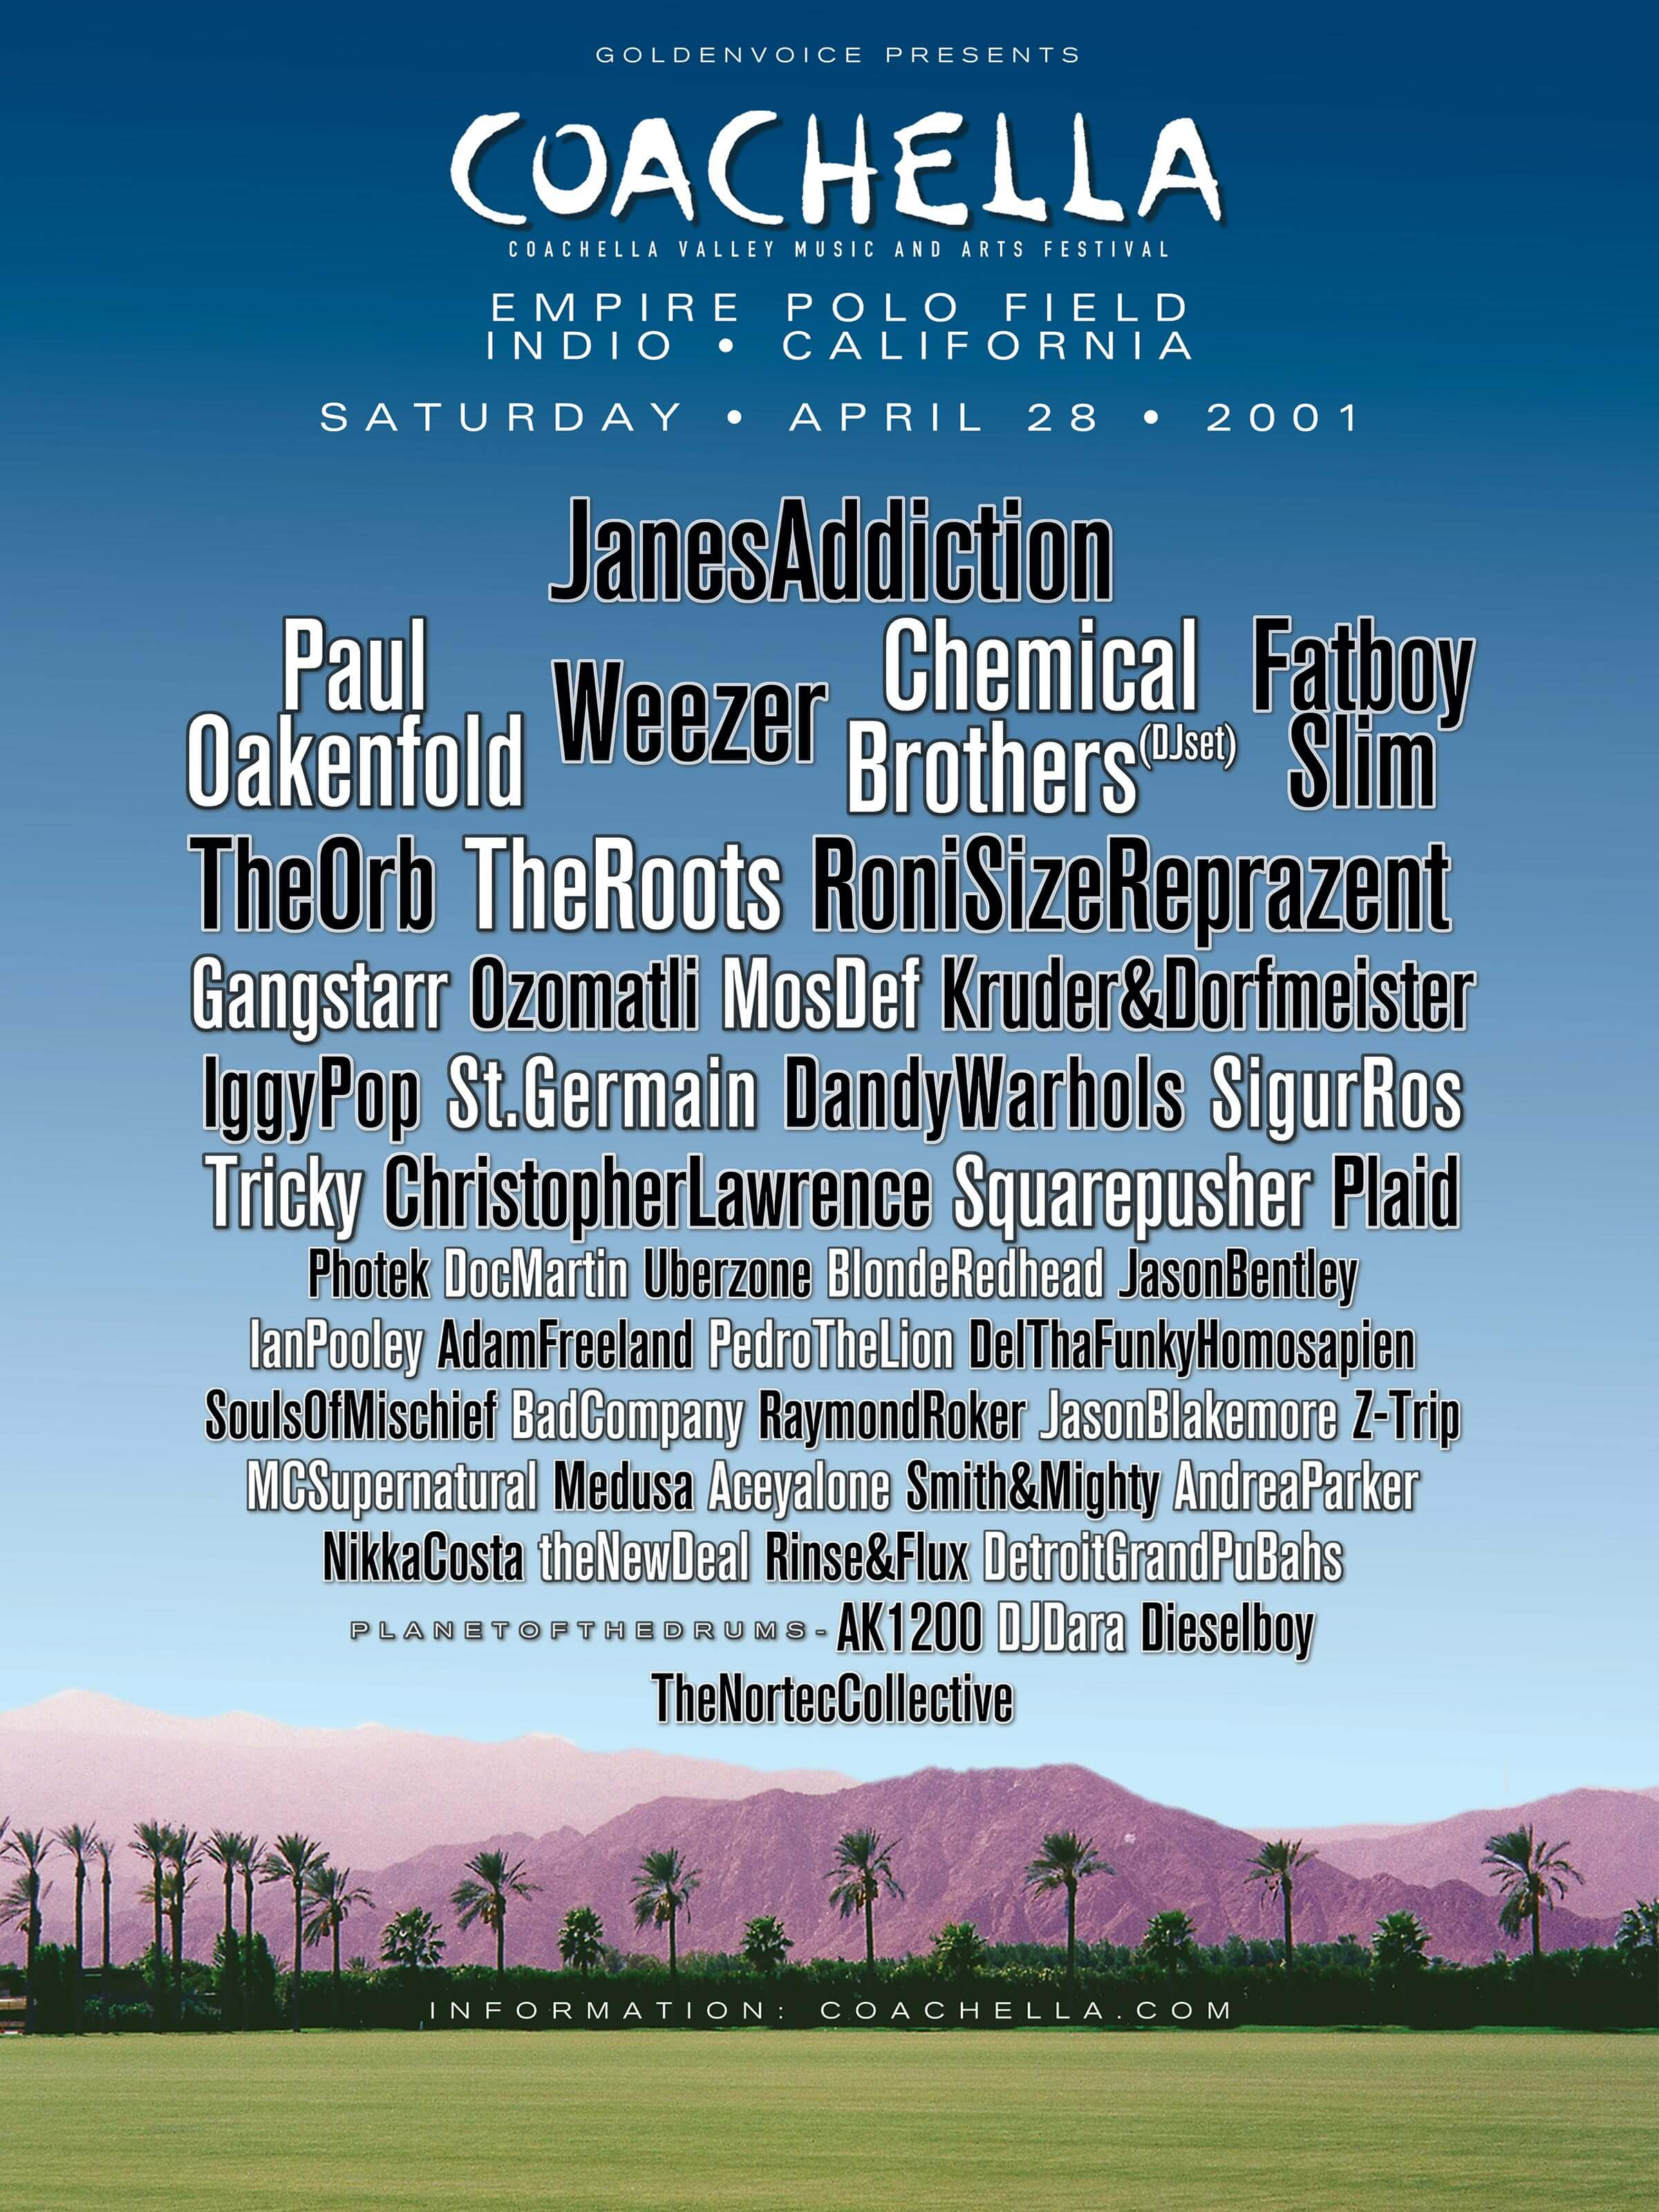 Coachella 2001 Lineup Poster